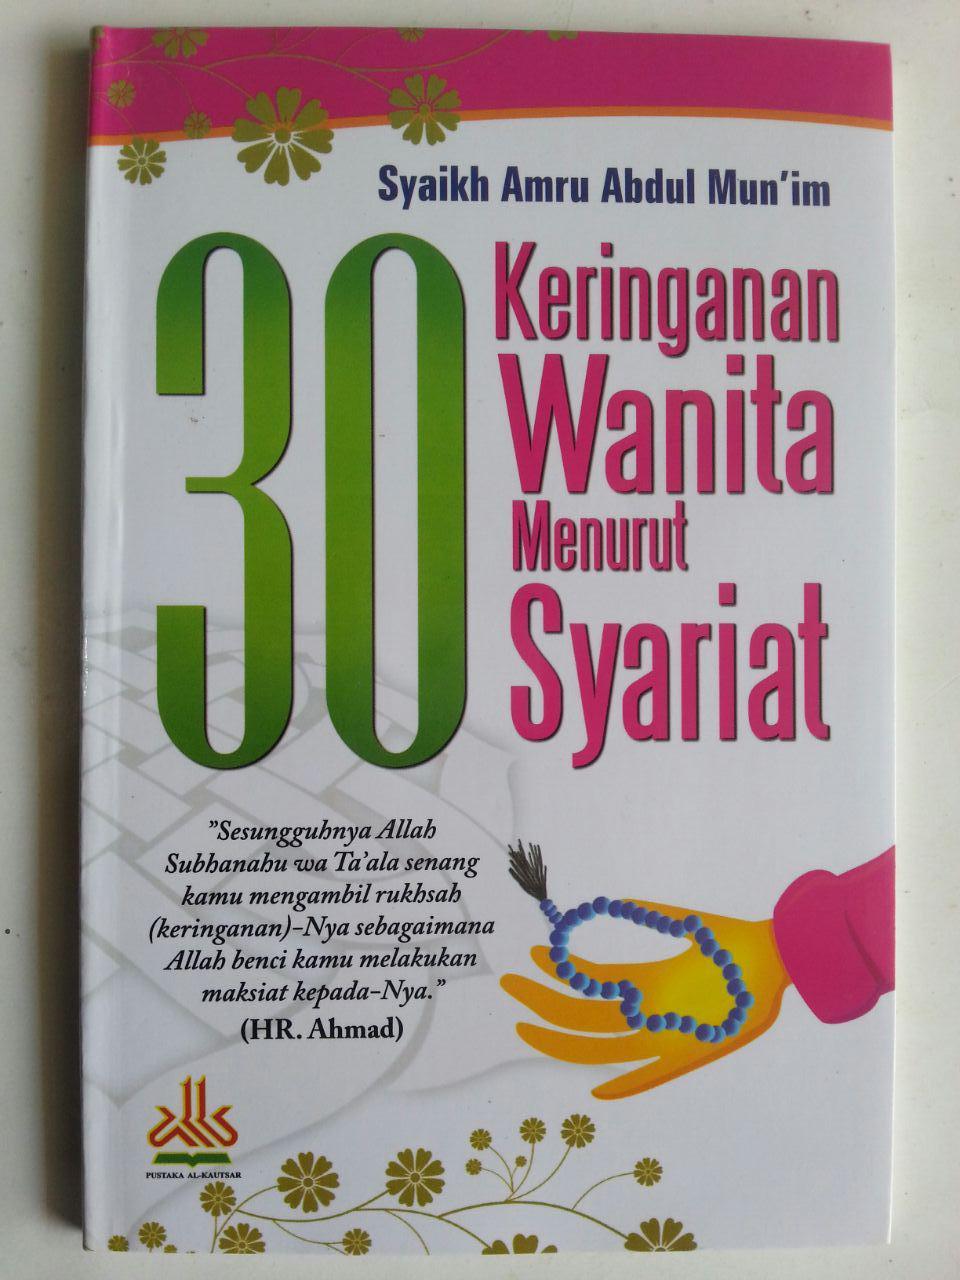 Buku 30 Keringanan Wanita Menurut Syariat cover 2